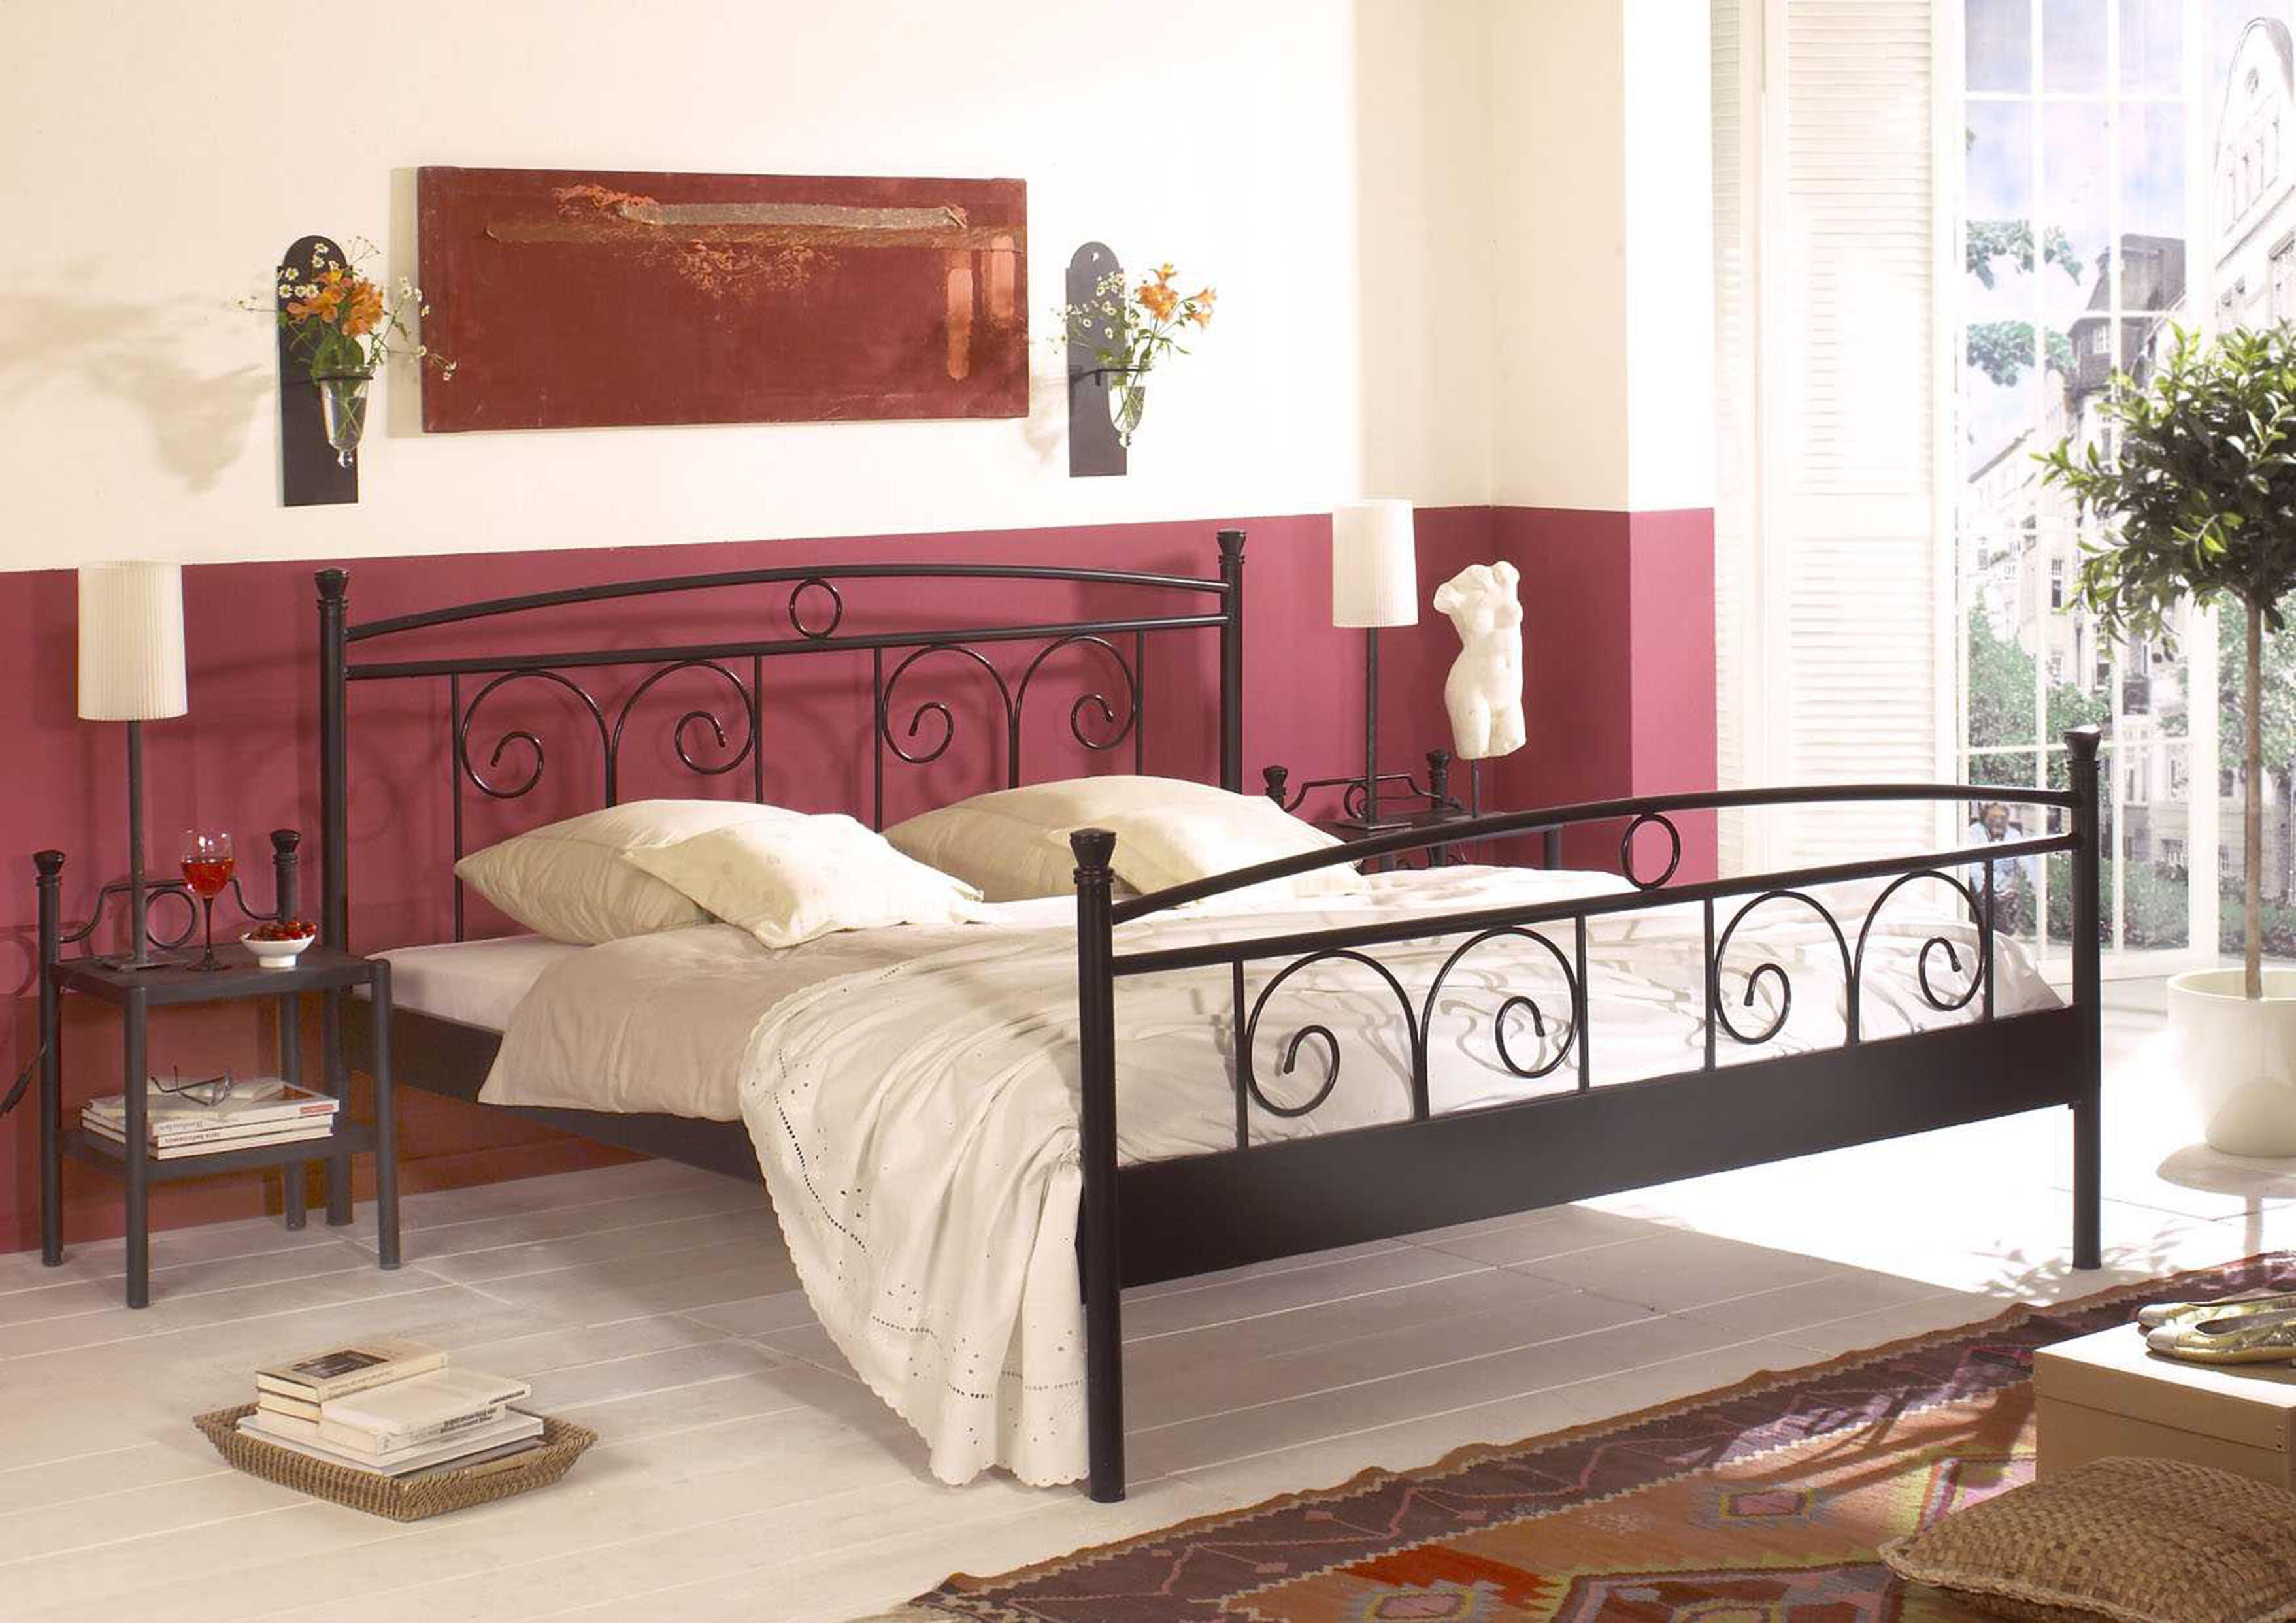 Modular Anpassbares Schlafzimmer-Set Roma | Wayfair.de